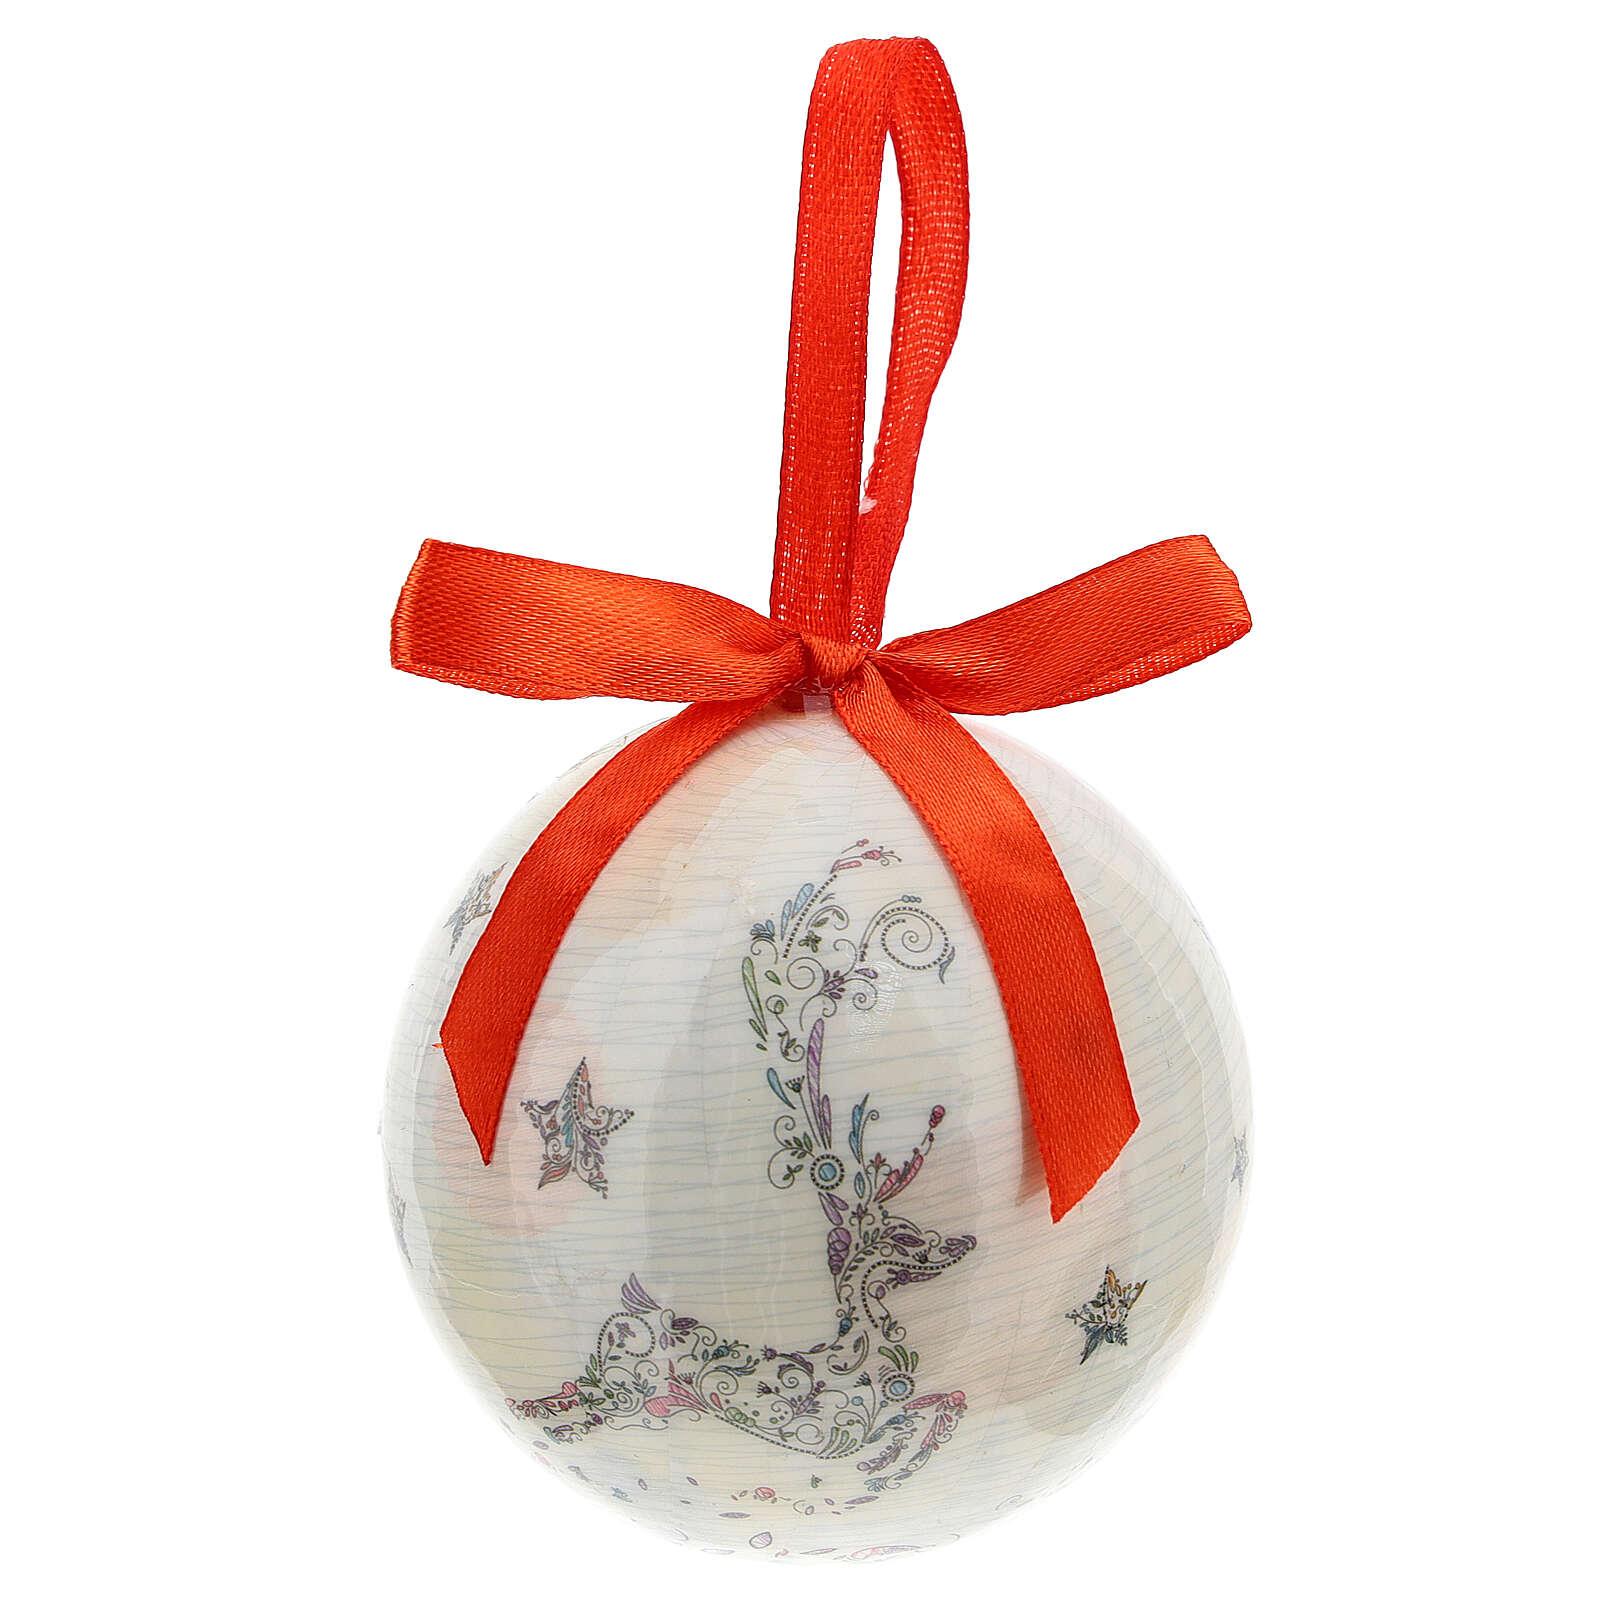 Pallina per albero Natale 75 mm bianca decoro floreale (assortita) 4